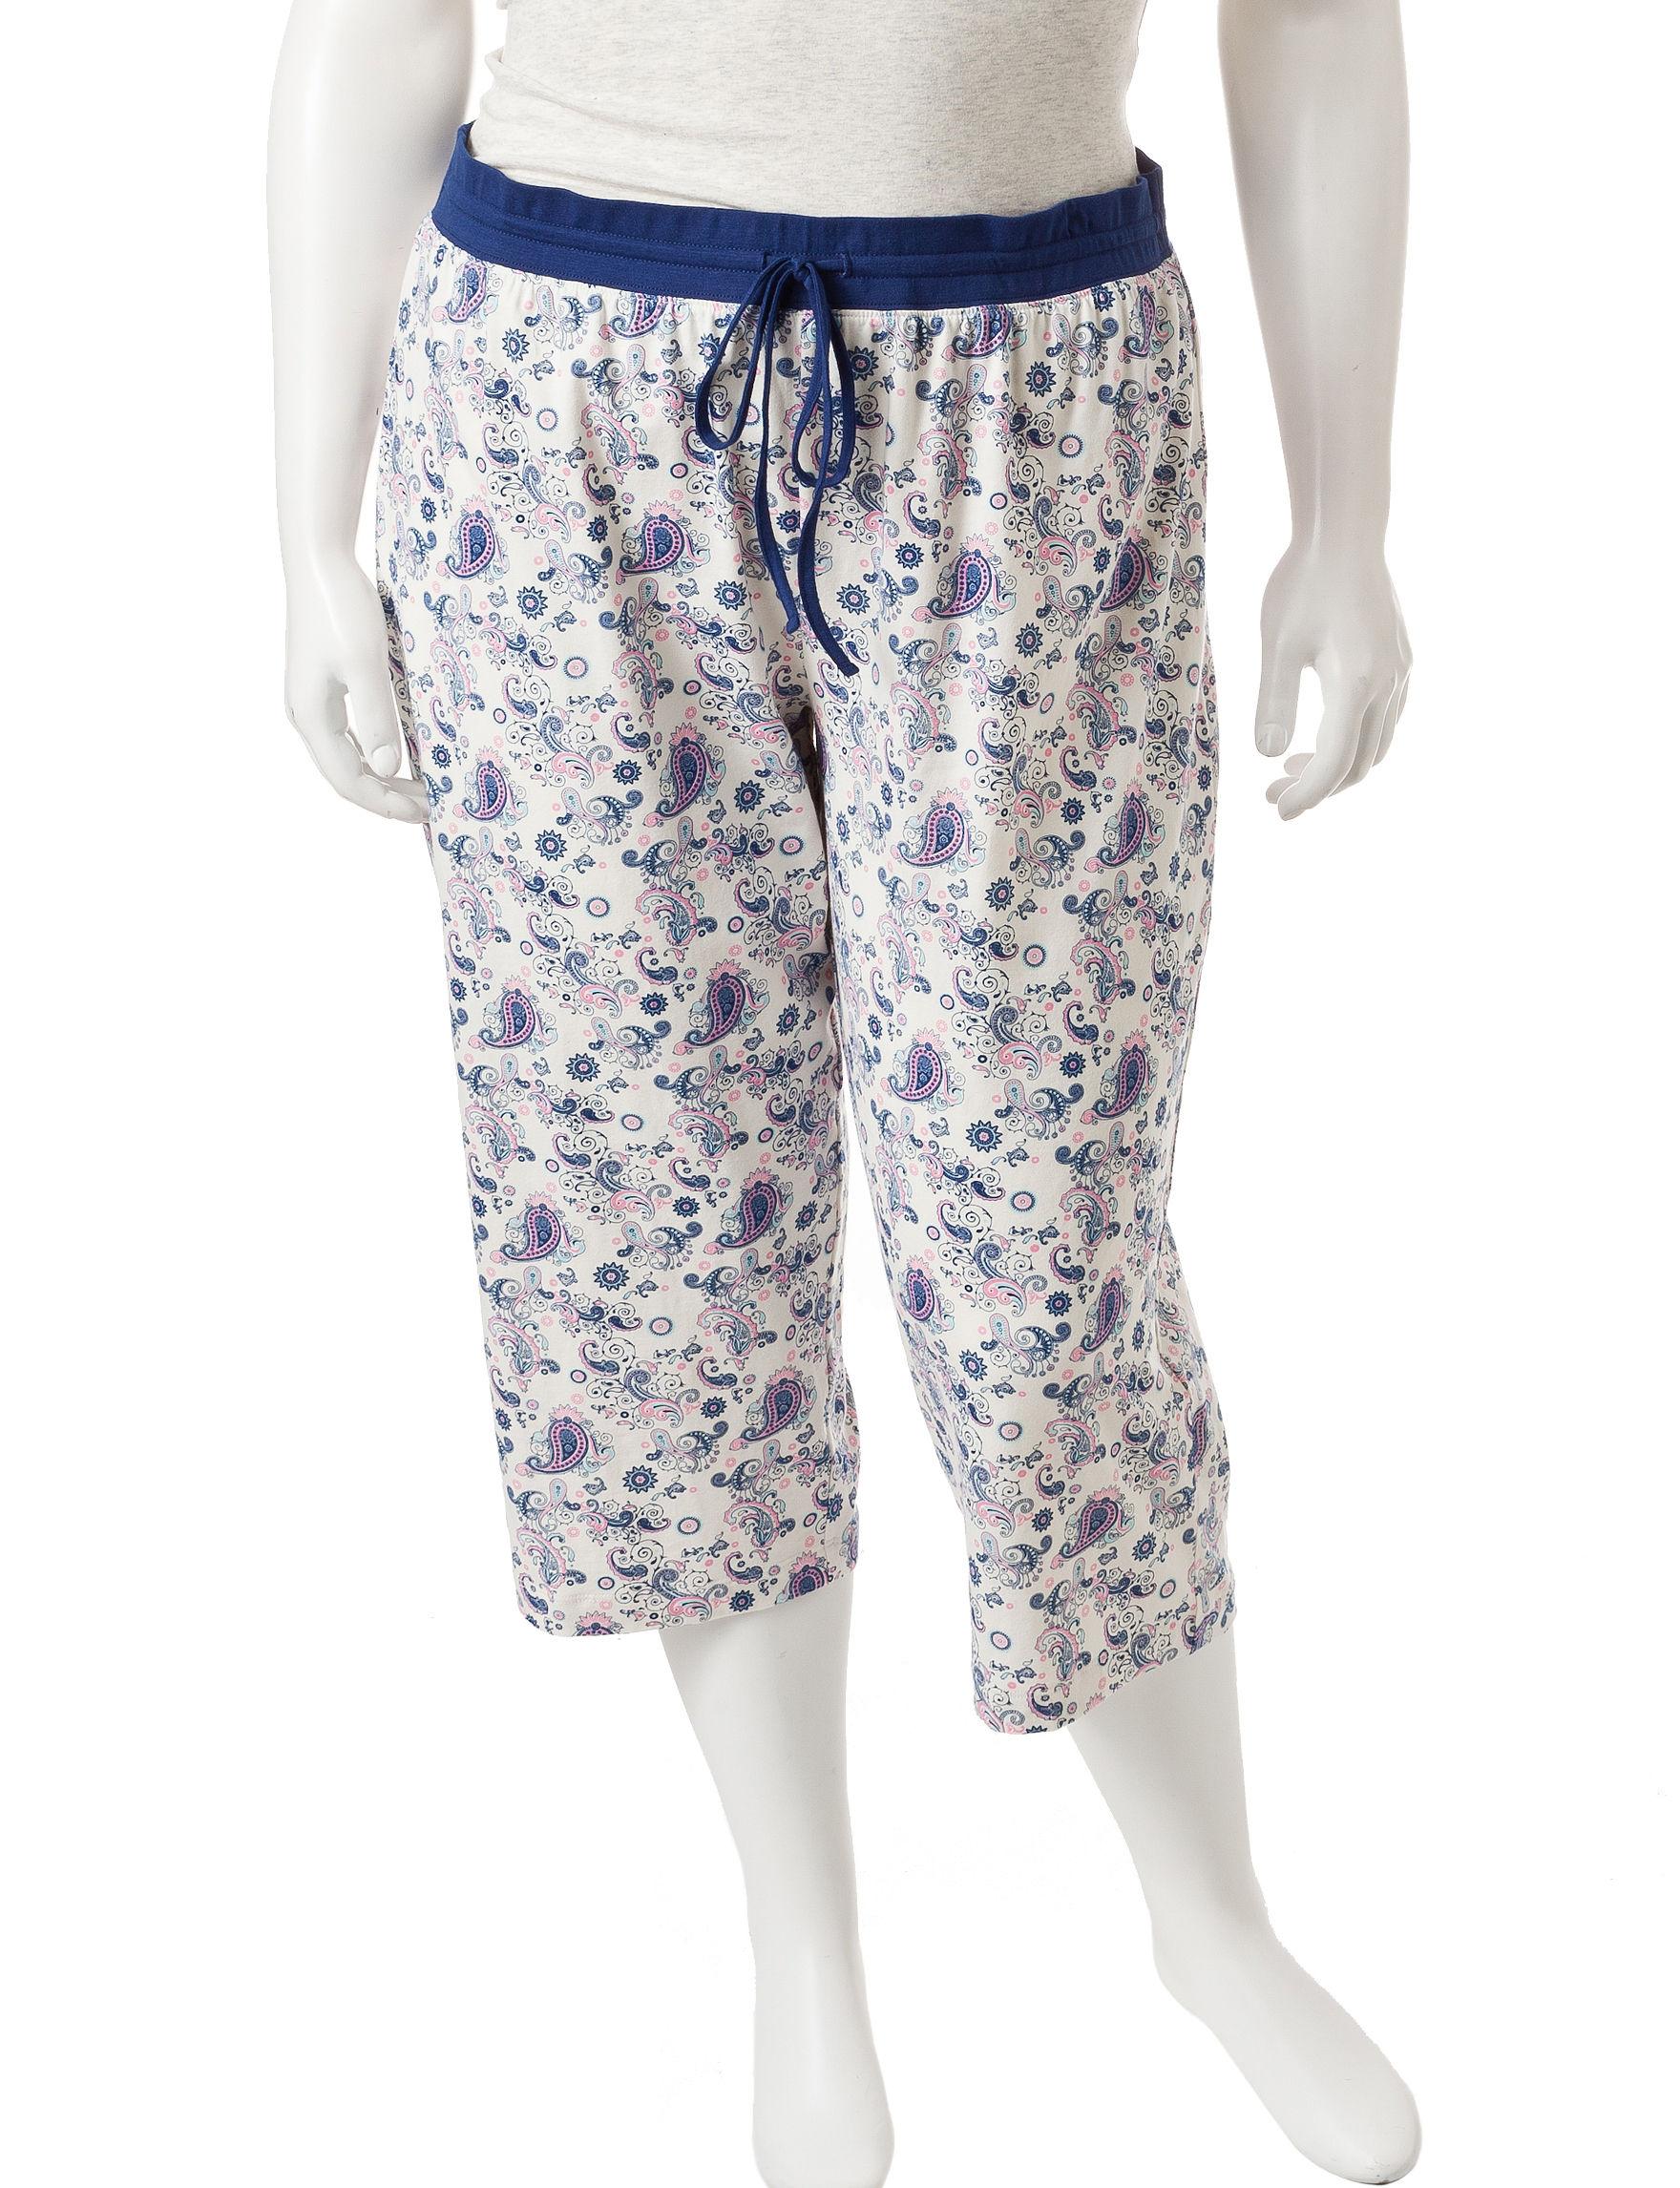 Rene Rofe Blue / White Pajama Bottoms